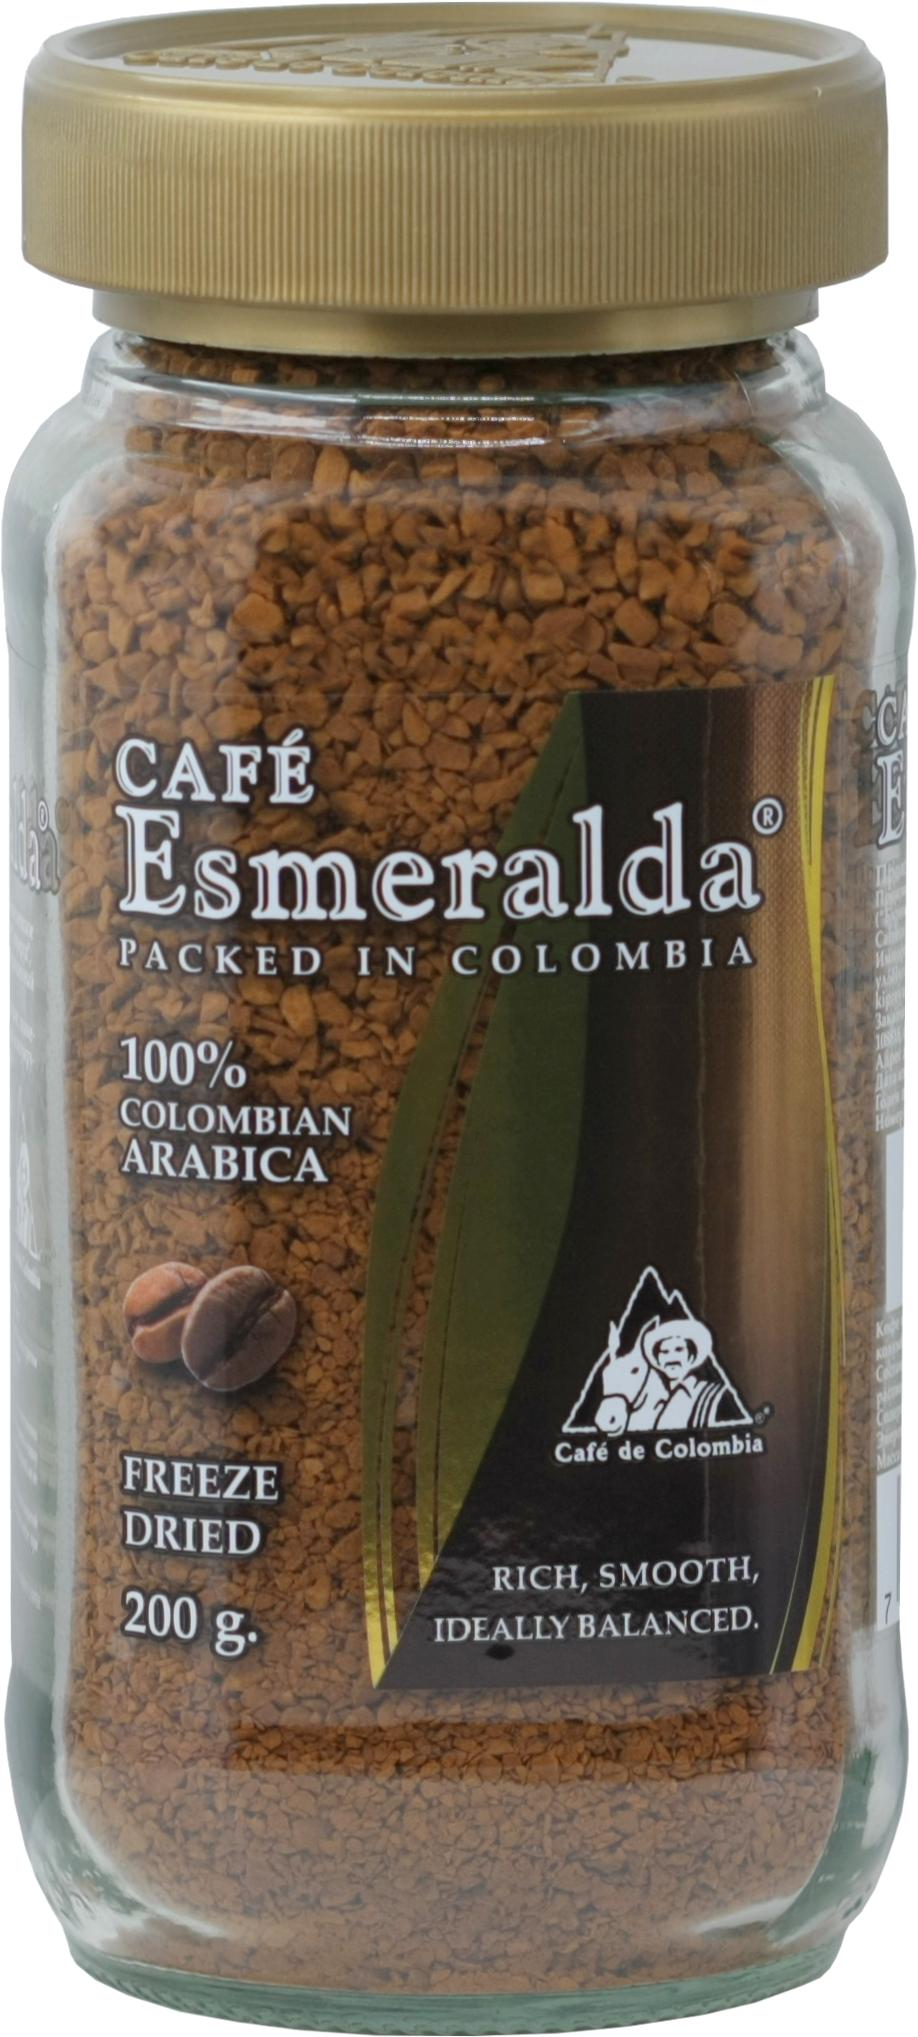 Cafe Esmeralda. Cafe Esmeralda 200 гр. стекл.банка